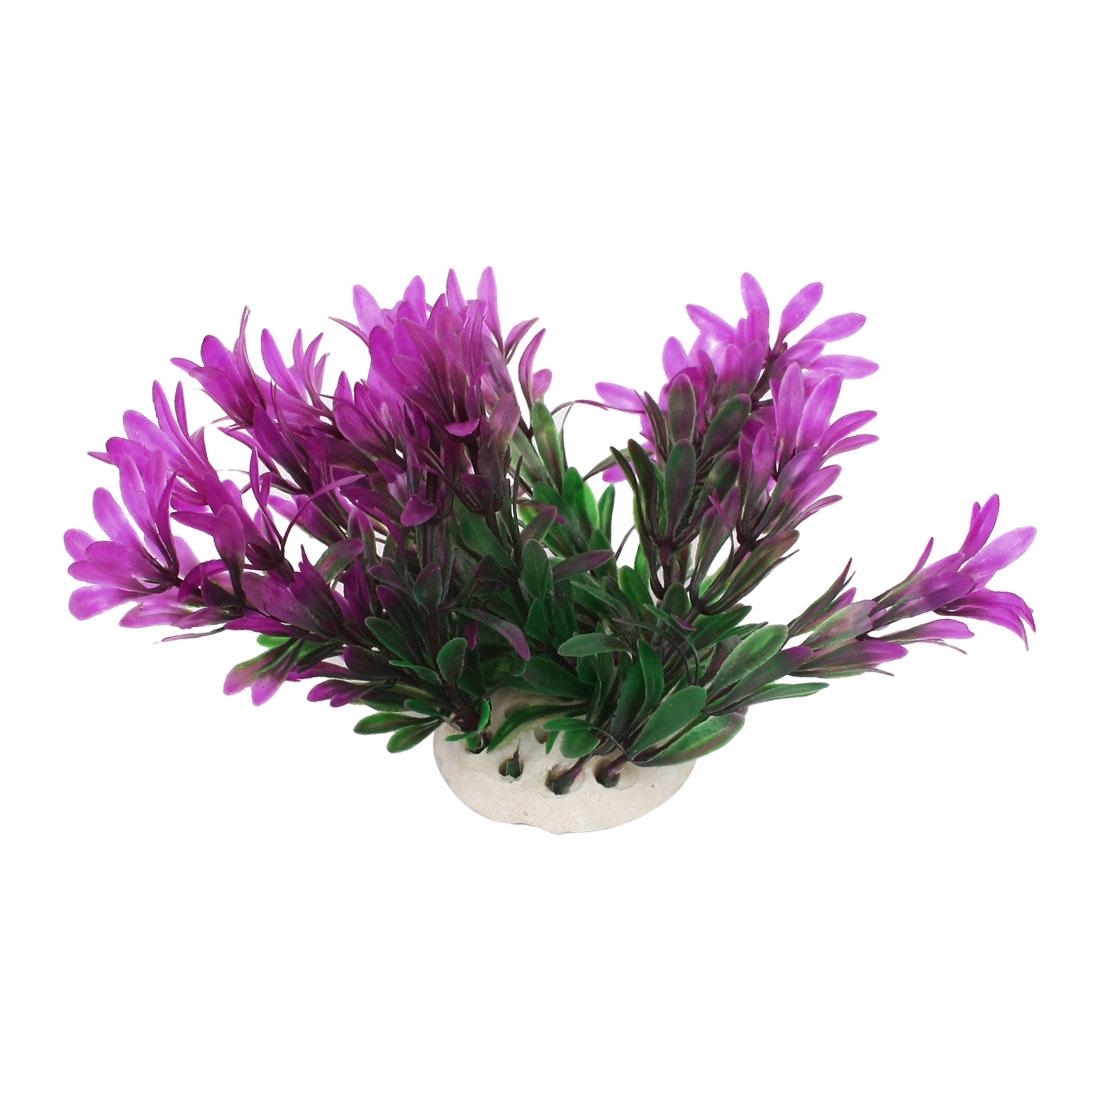 "Round Shape Ceramic Base Fuchsia Green Grass Ornament 3.9"" High for Aquarium"